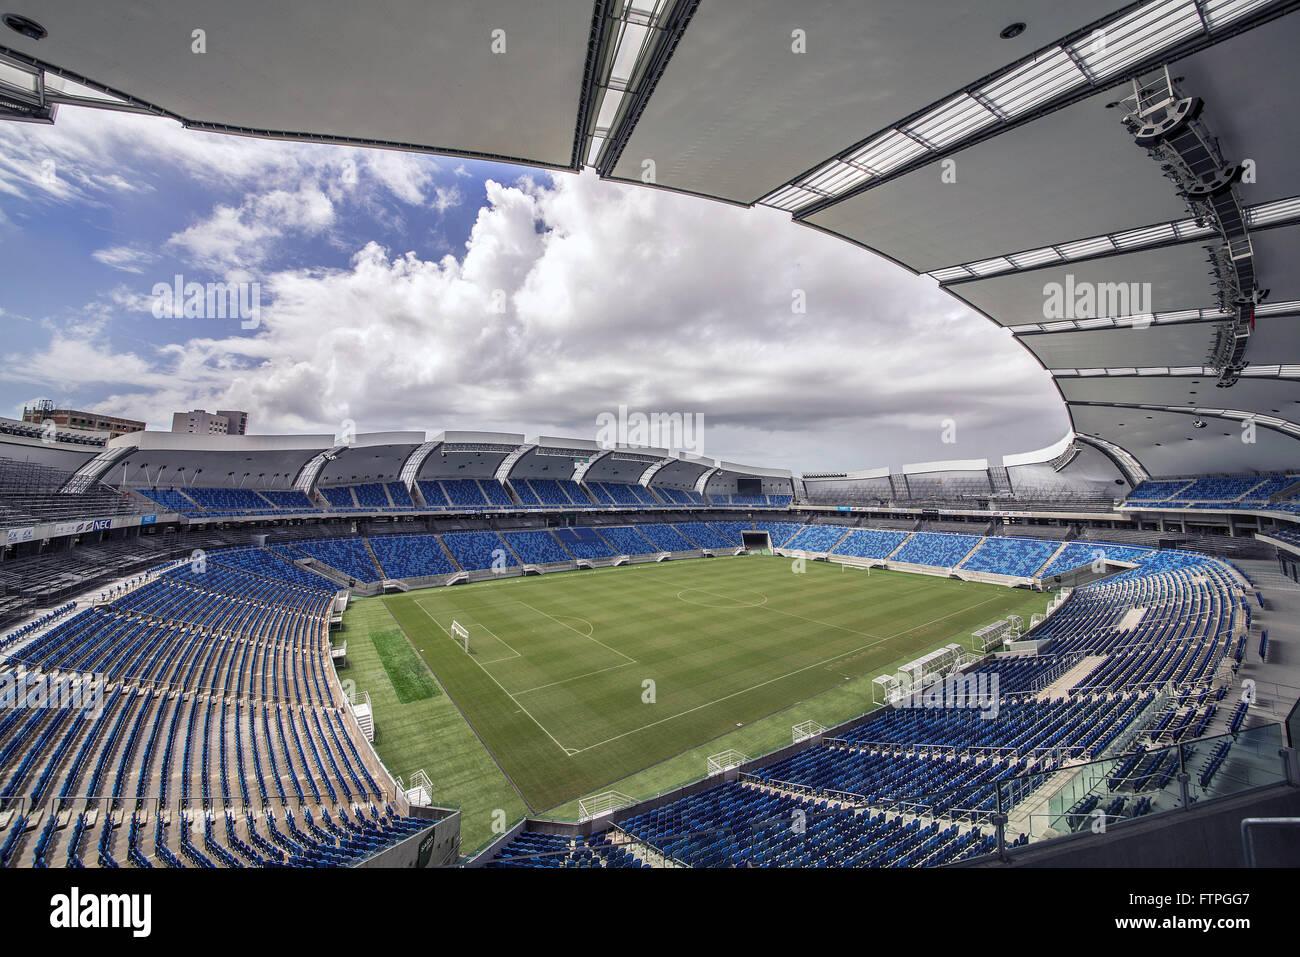 Arena das Dunas - stadium built to host the 2014 FIFA World Cup - Stock Image